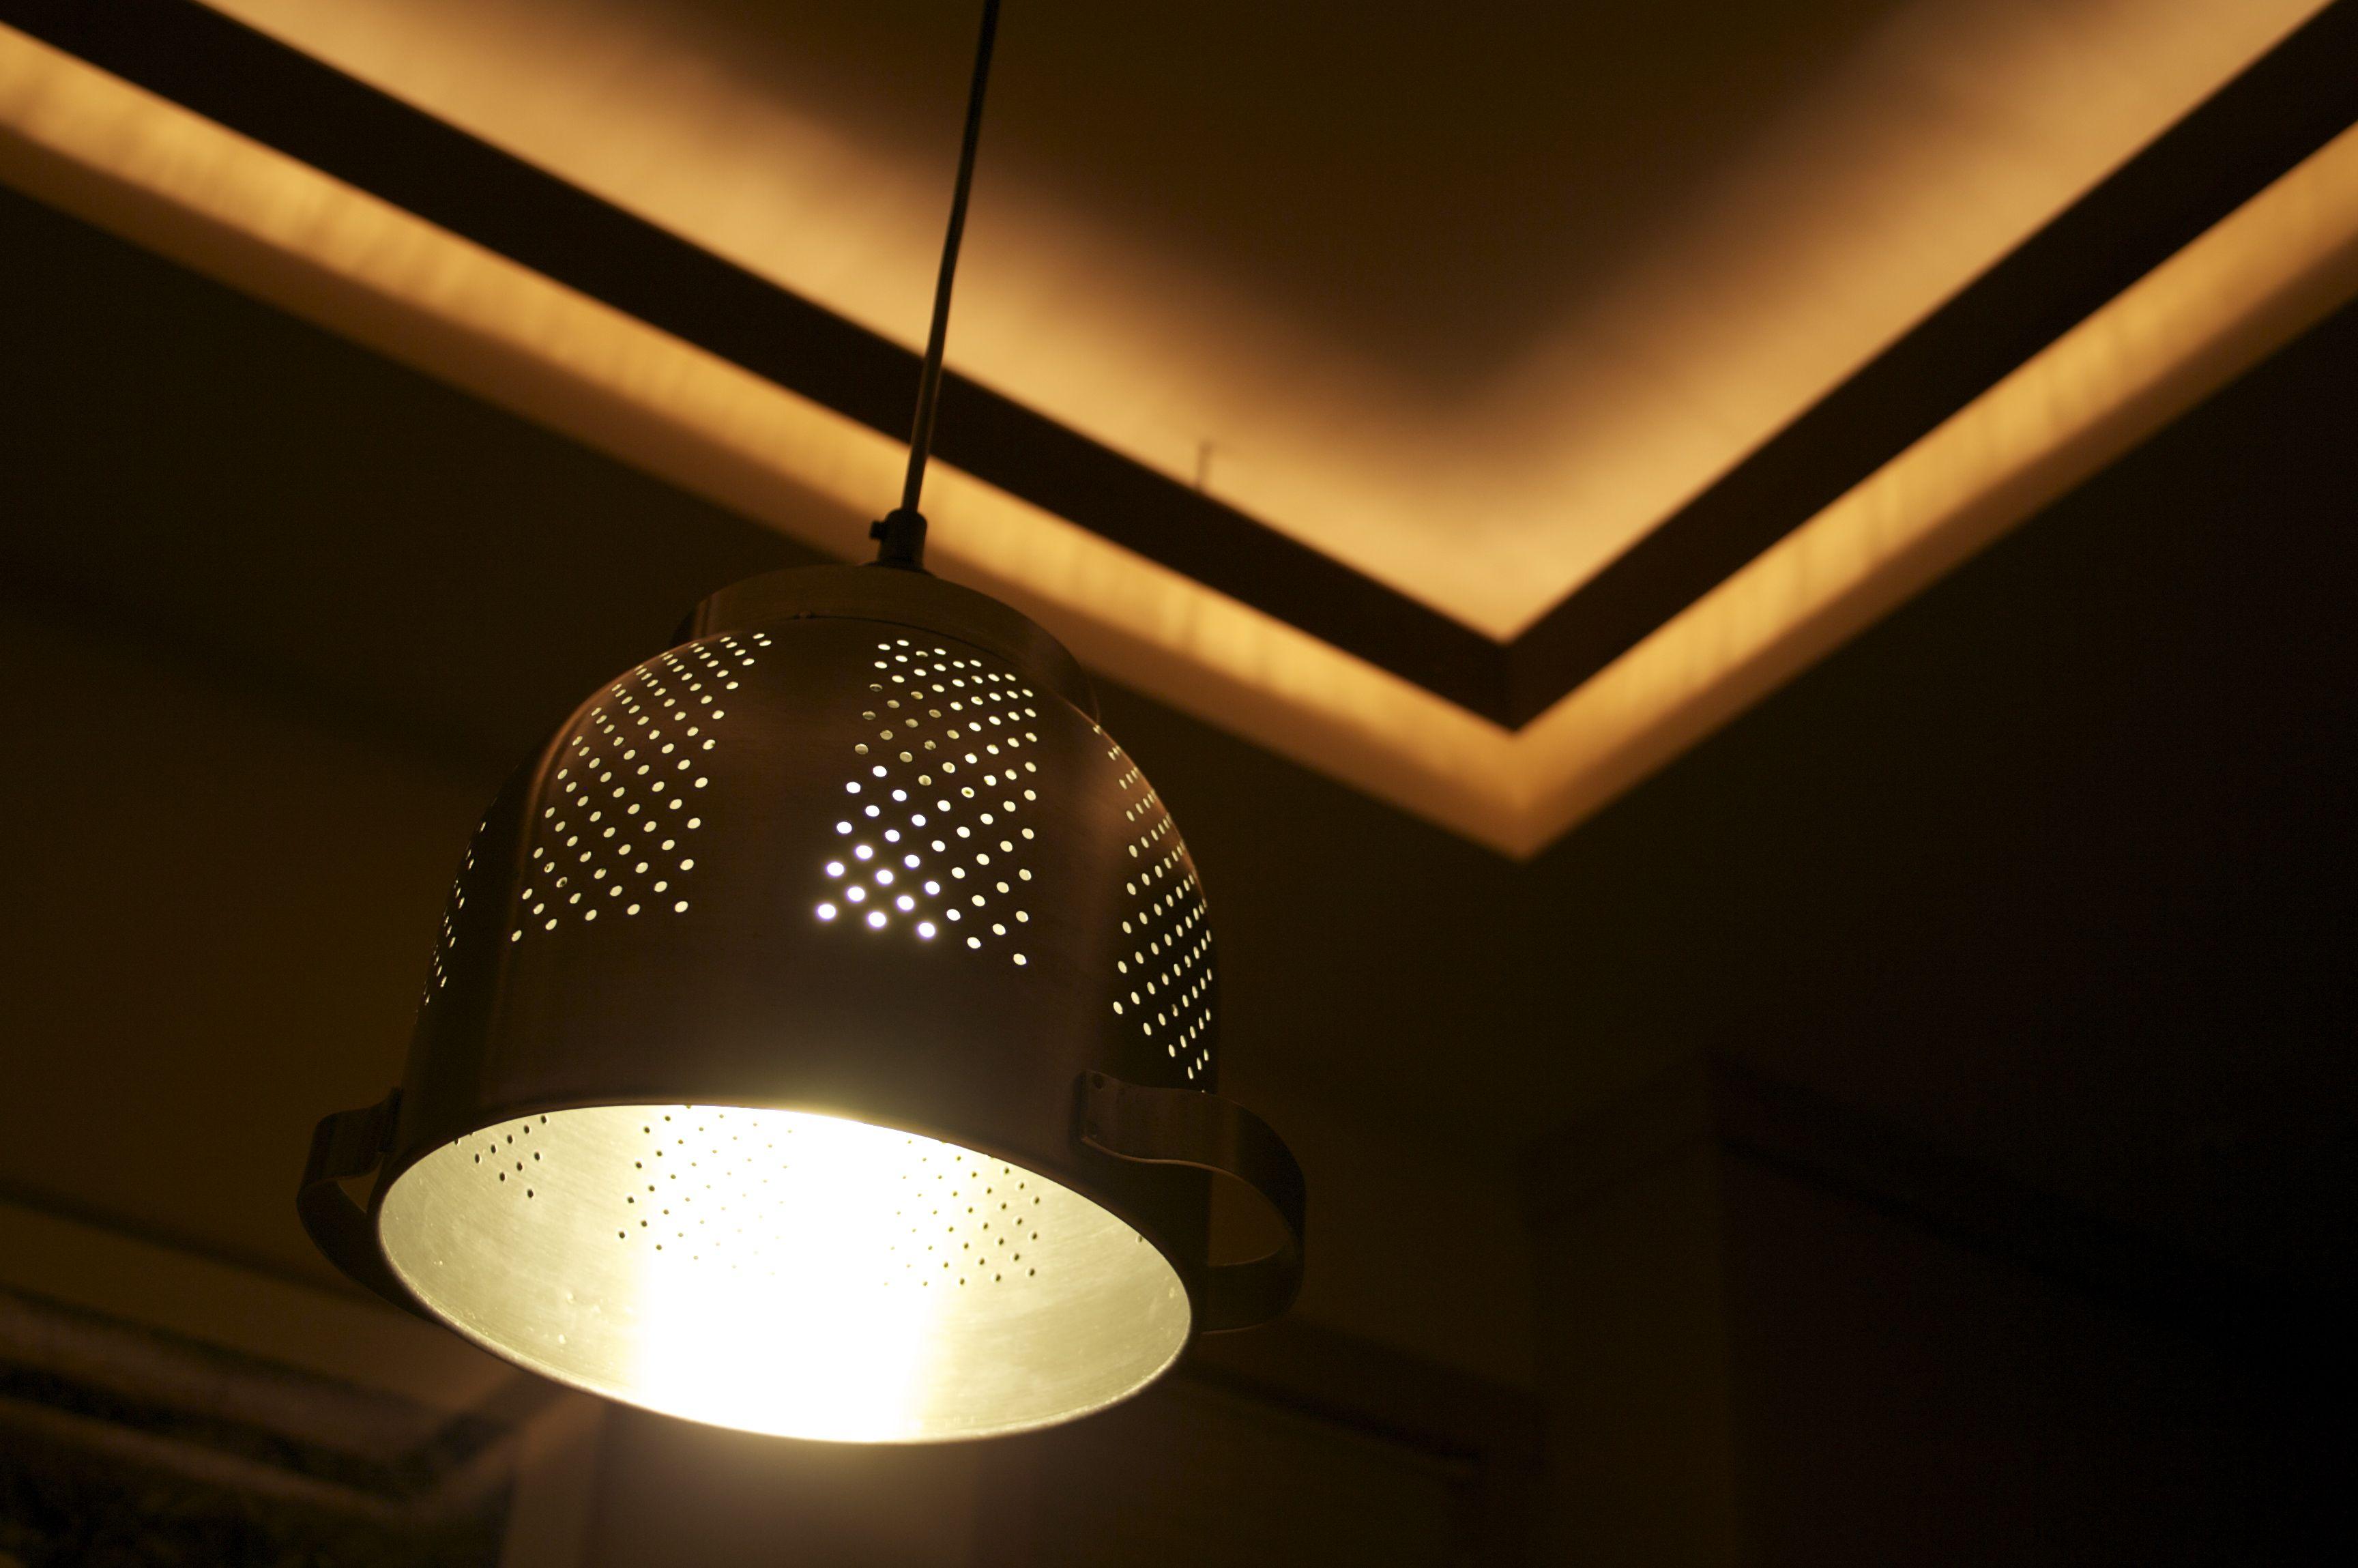 Hanging Colander Lamp Shade